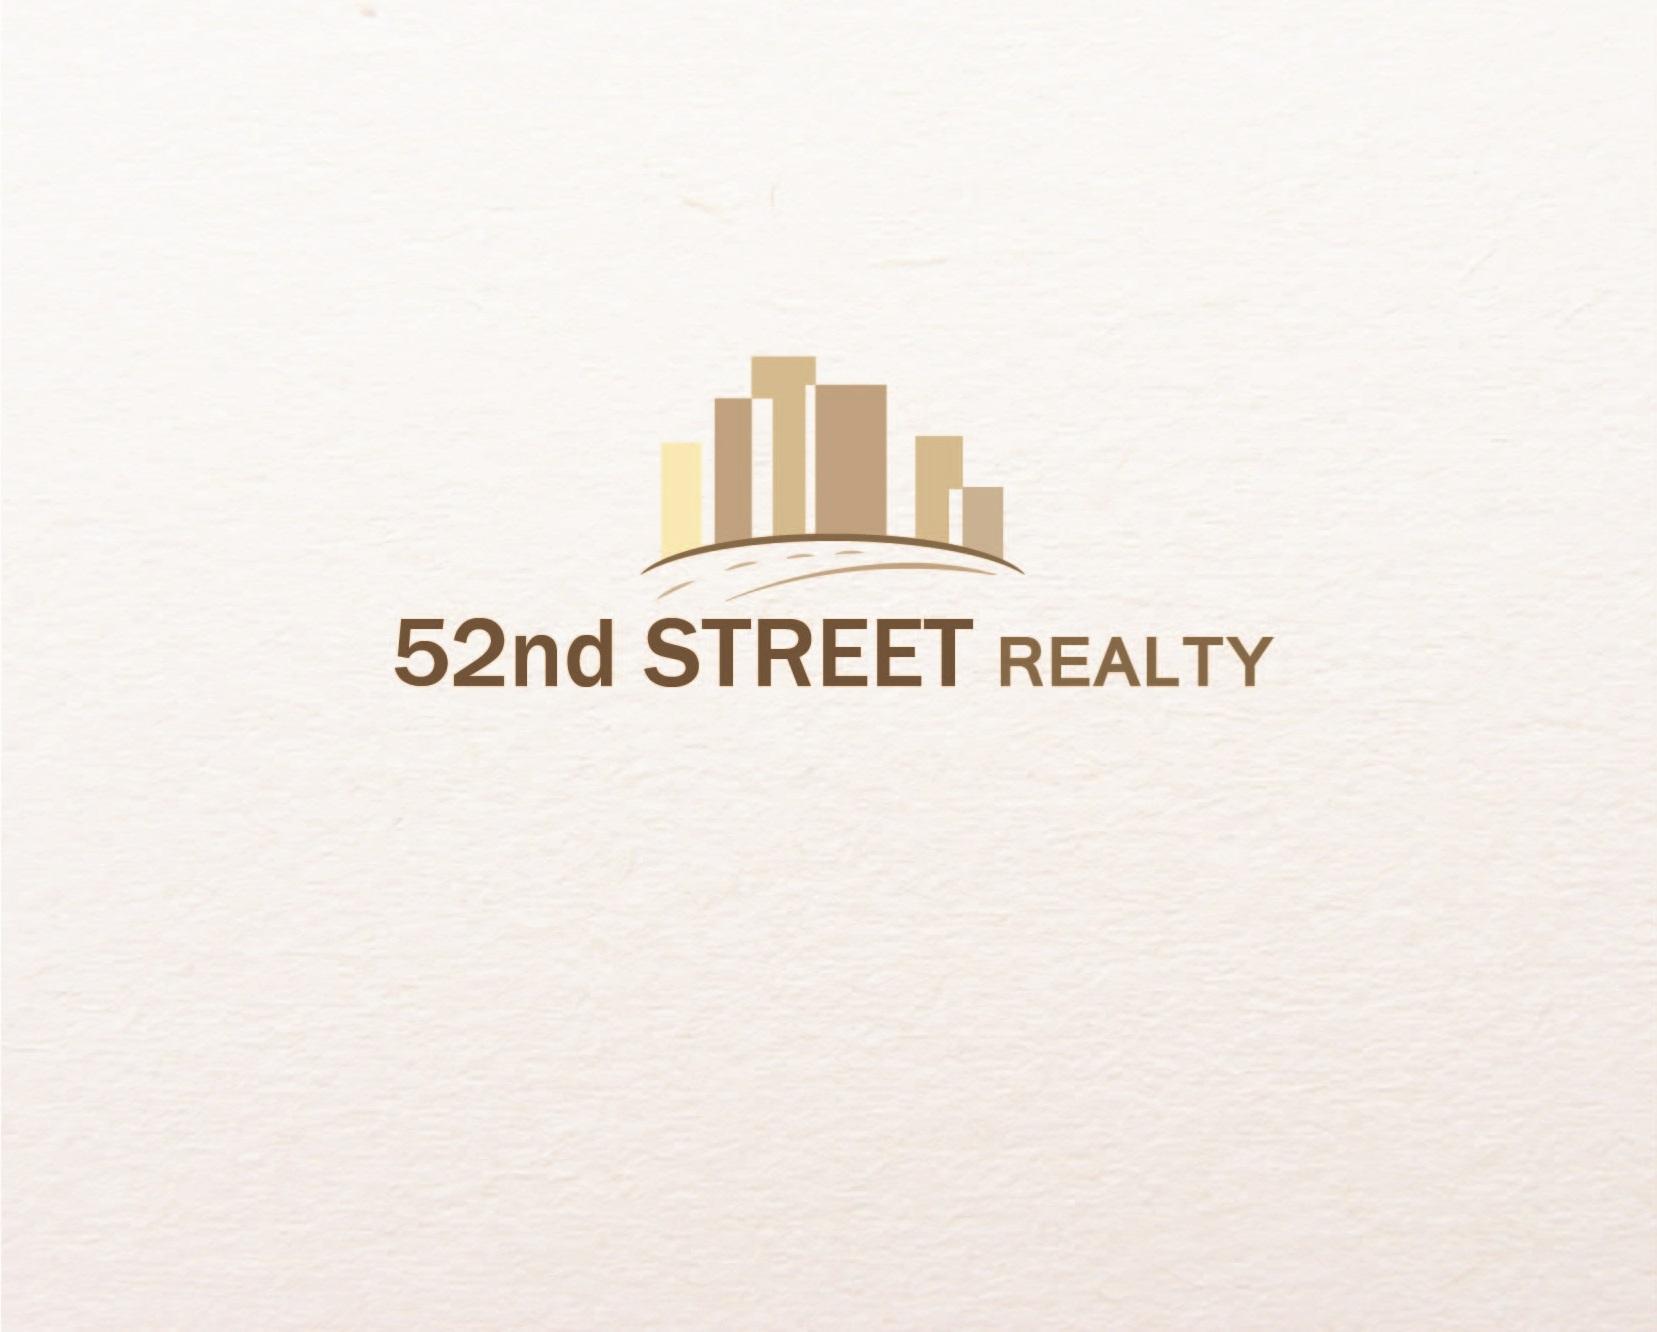 Logo Design by iwyn - Entry No. 38 in the Logo Design Contest 52nd Street Realty Logo Design.